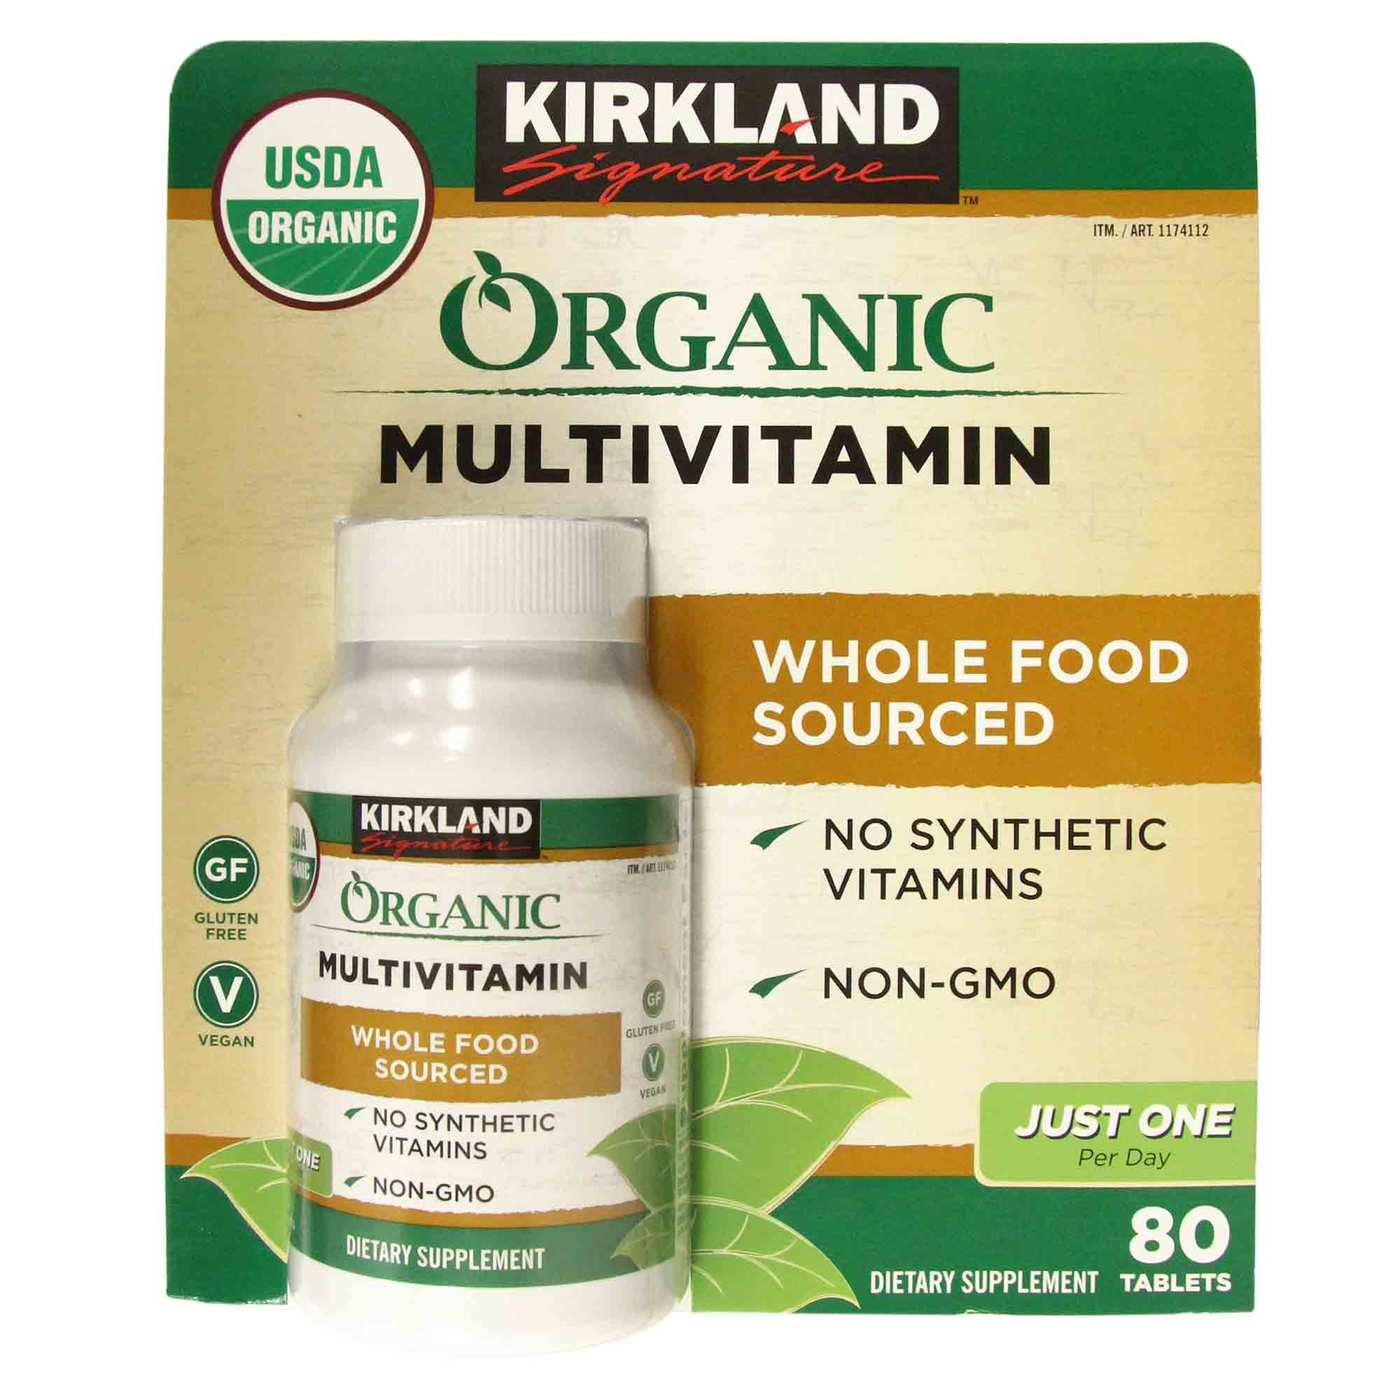 Kirkland Signature Organic Multivitamin One Per Day 80 Tablets